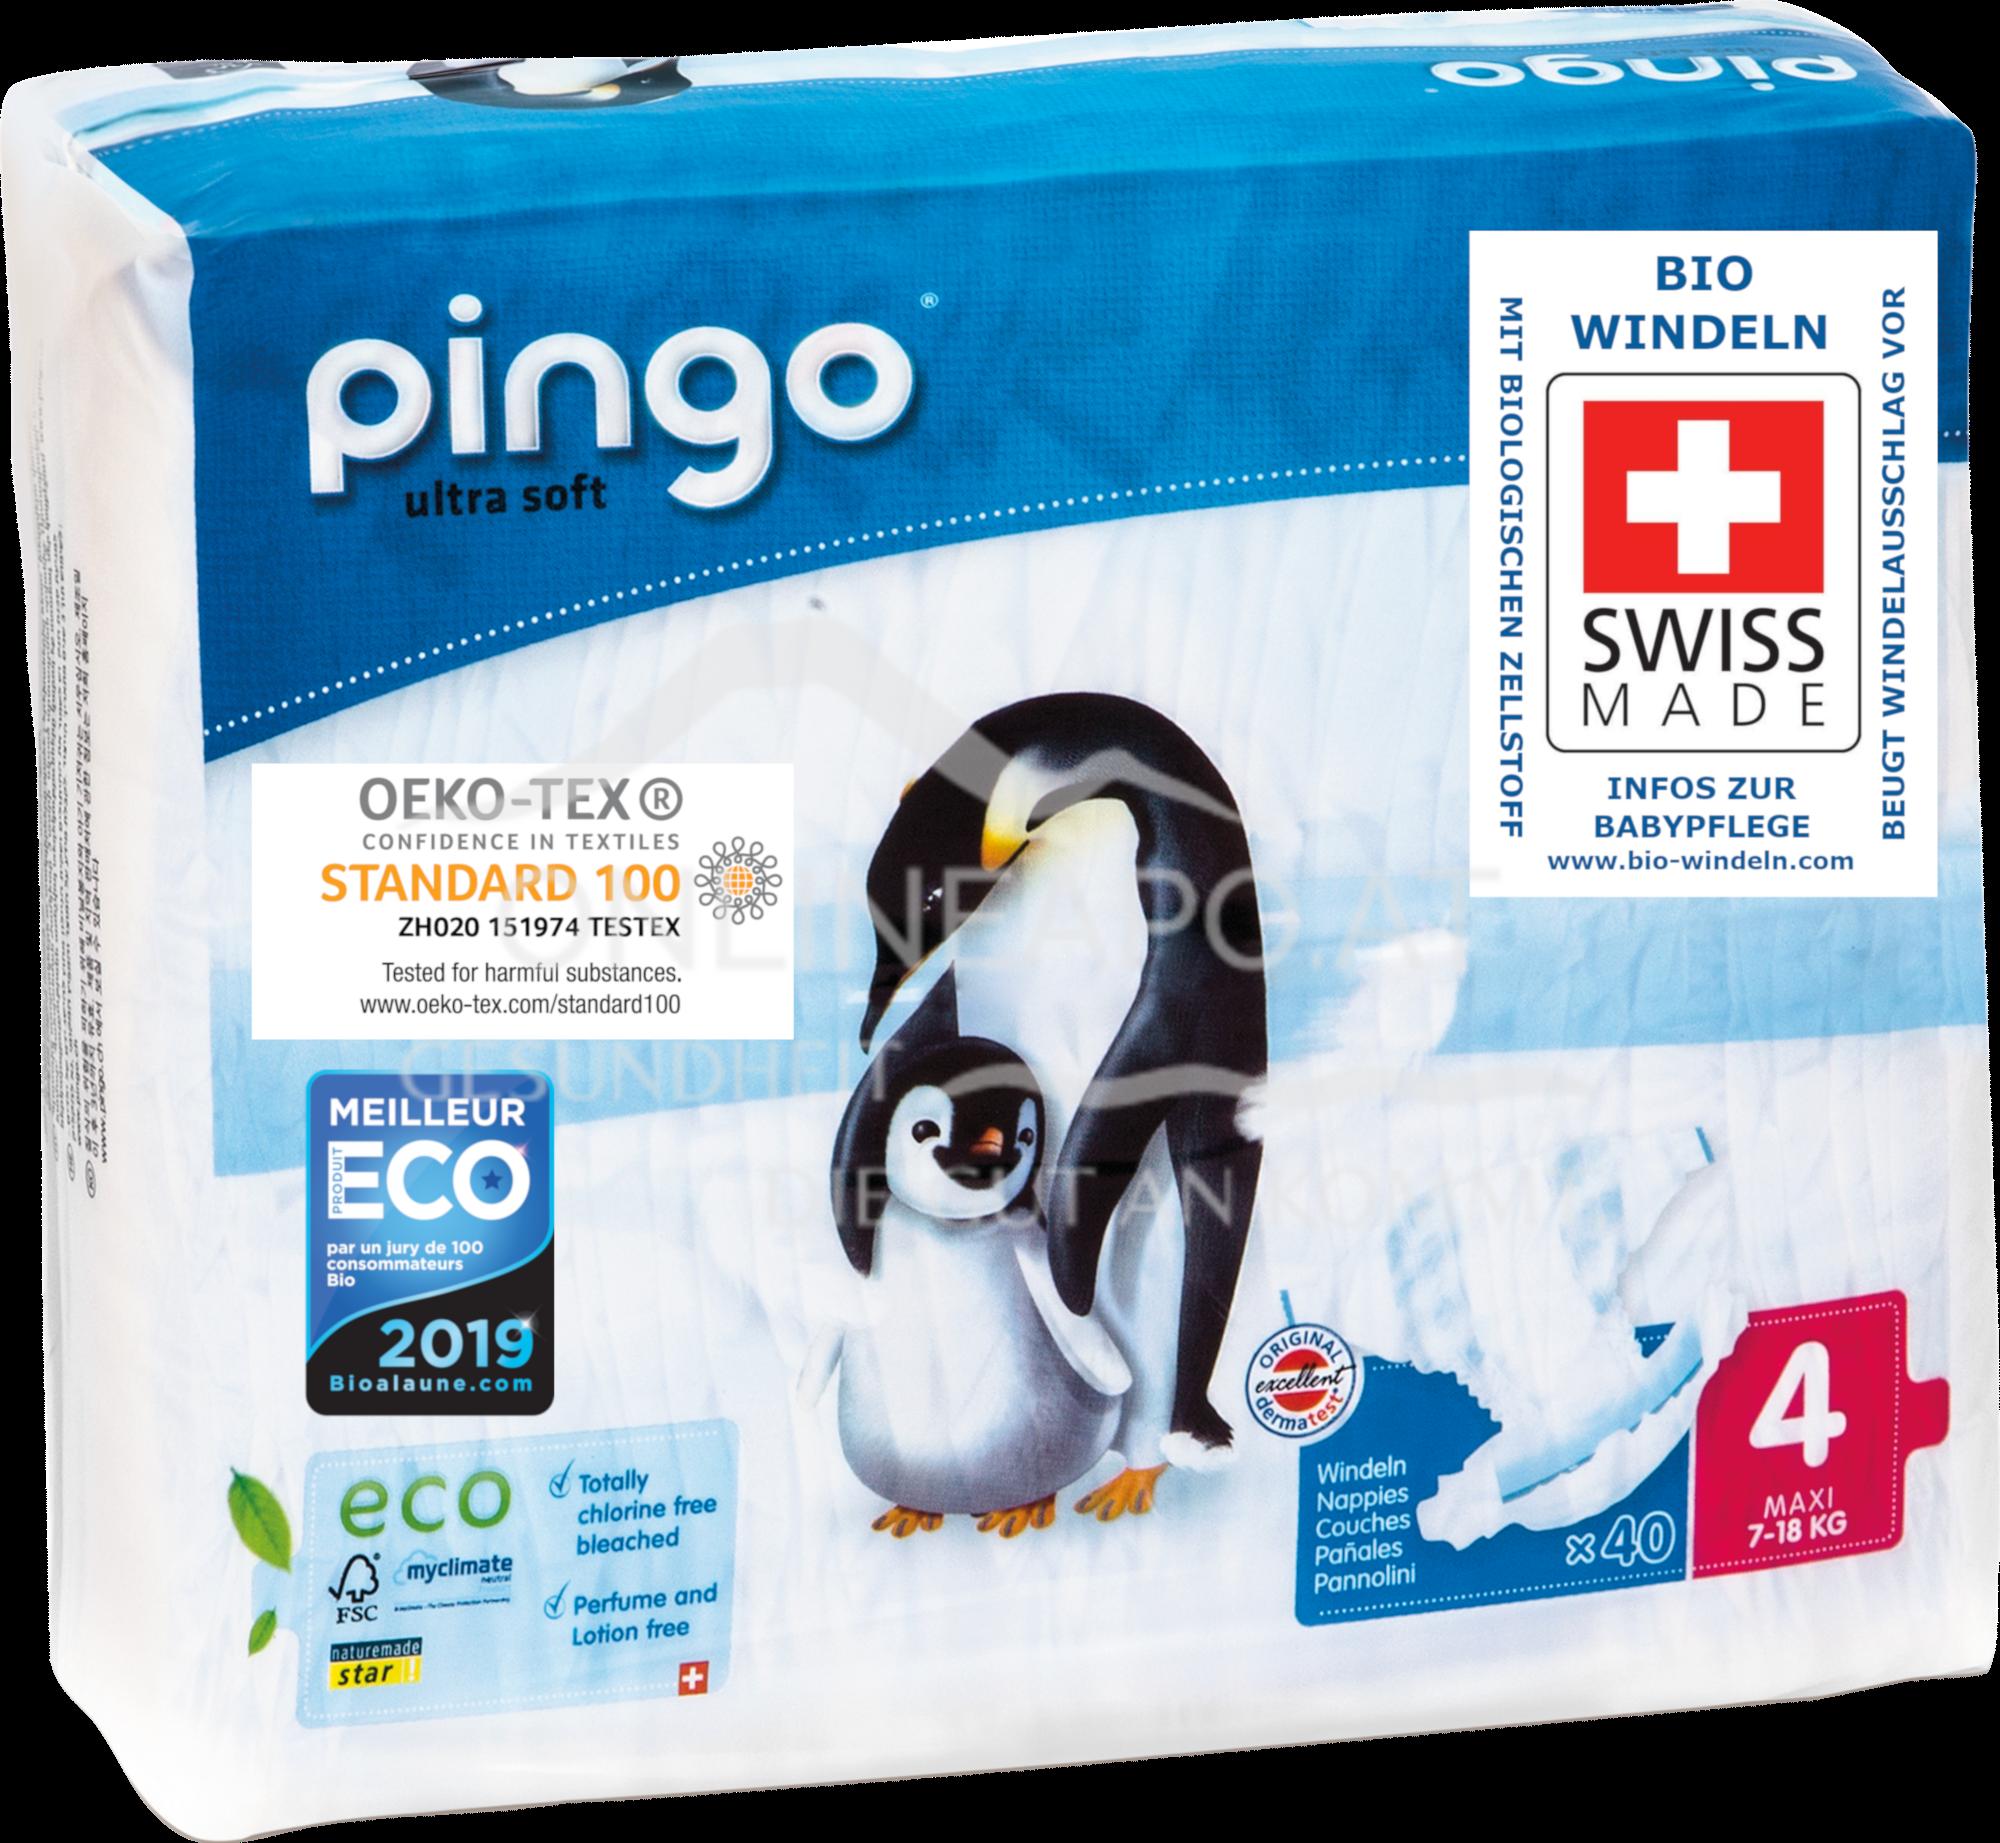 Bio Windeln Maxi 7-18kg Pinguin – Pingo Swiss